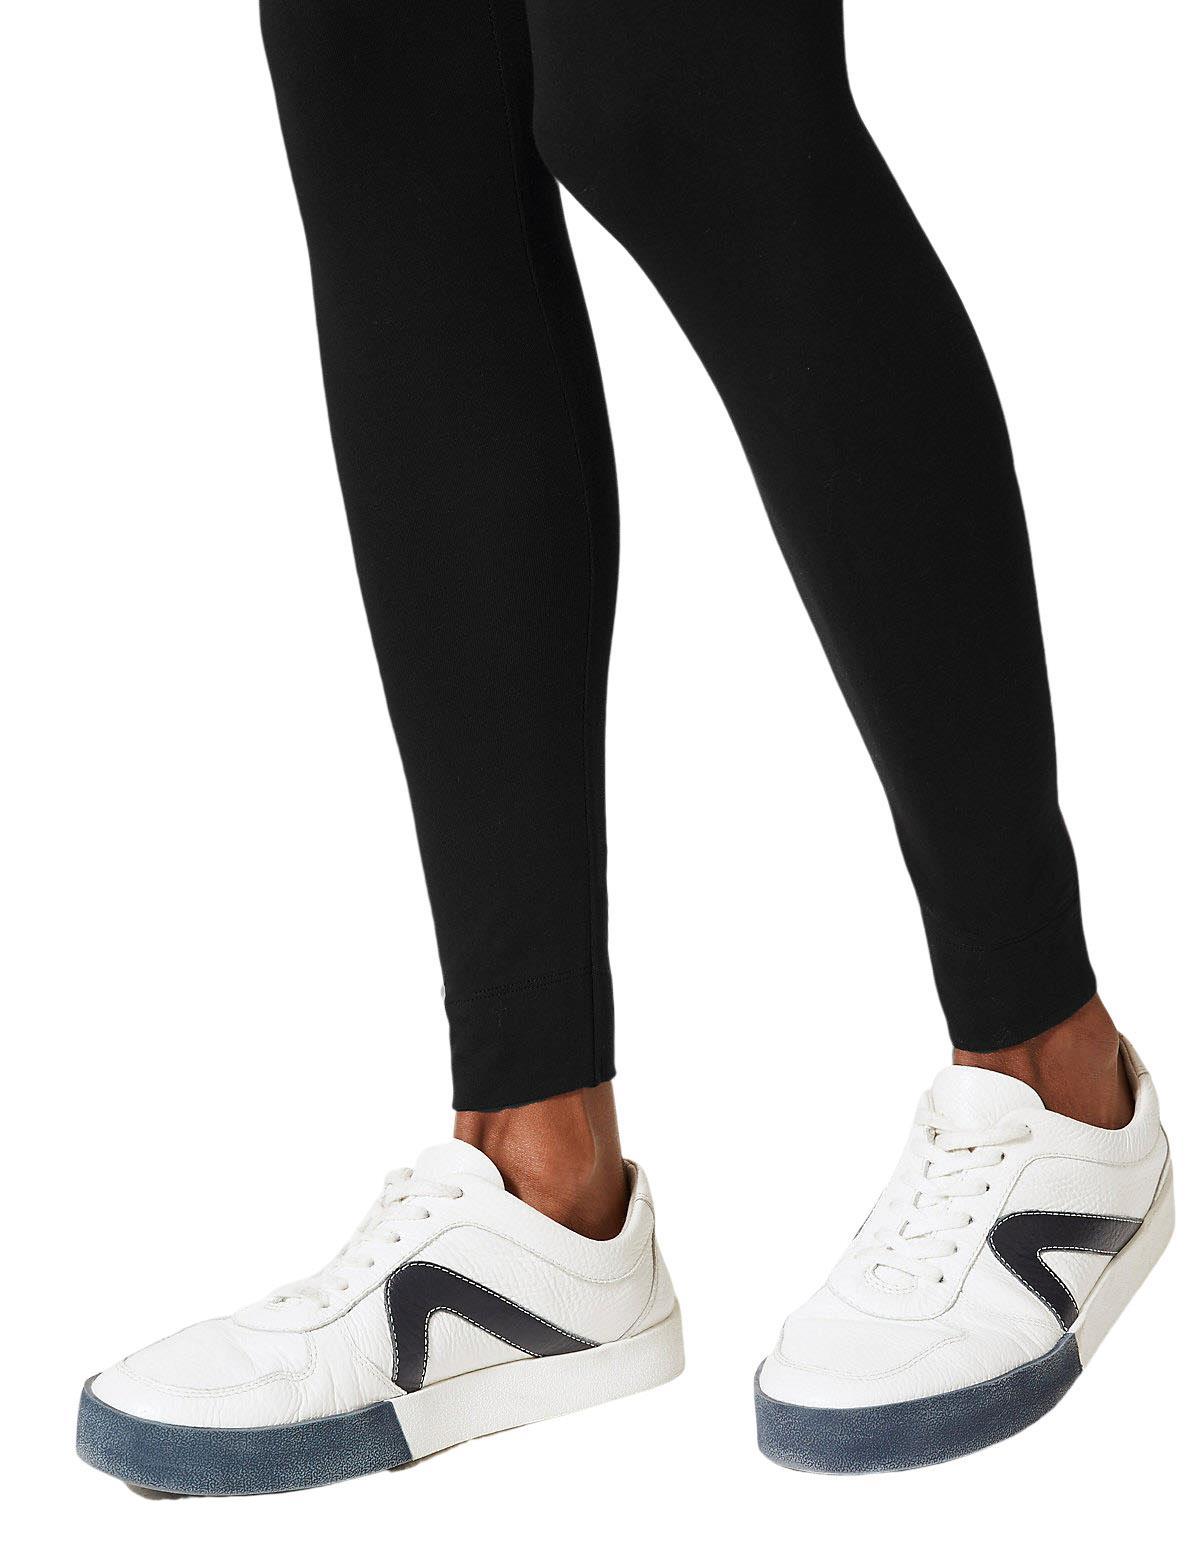 Ex M/&S Leggings Navy Berry Charcoal Grey Black Size 6-24